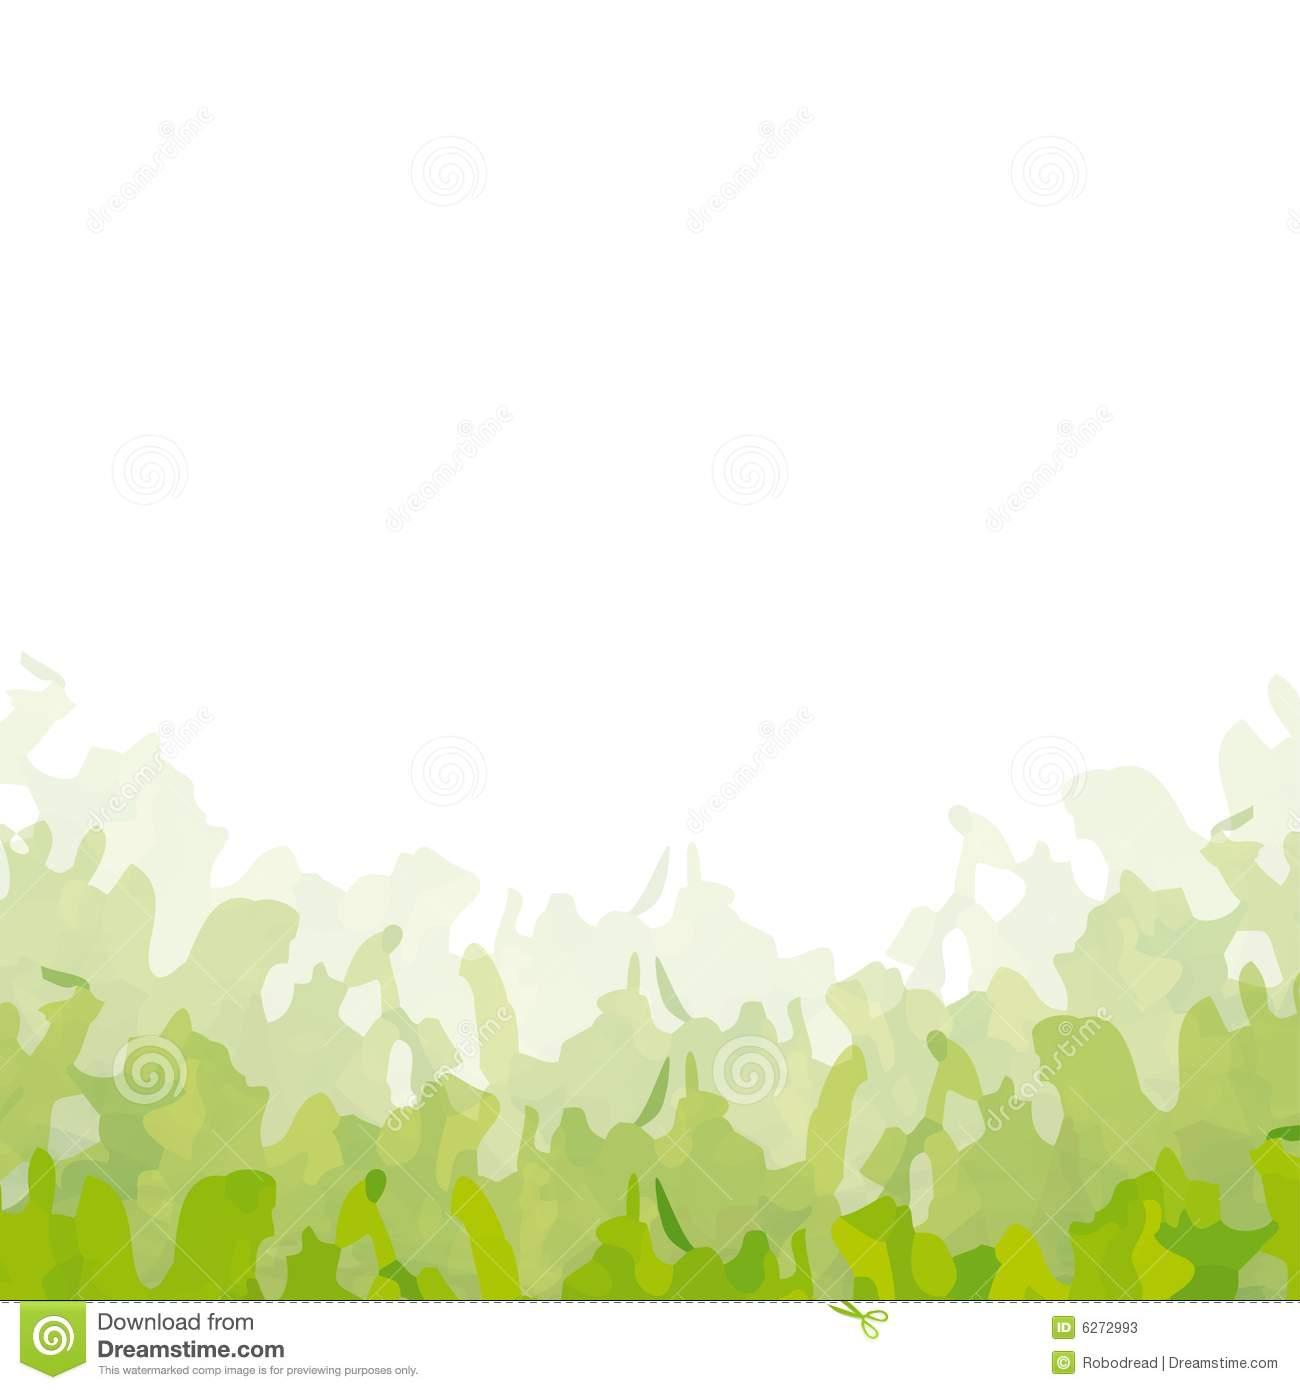 Grass Vector No Background